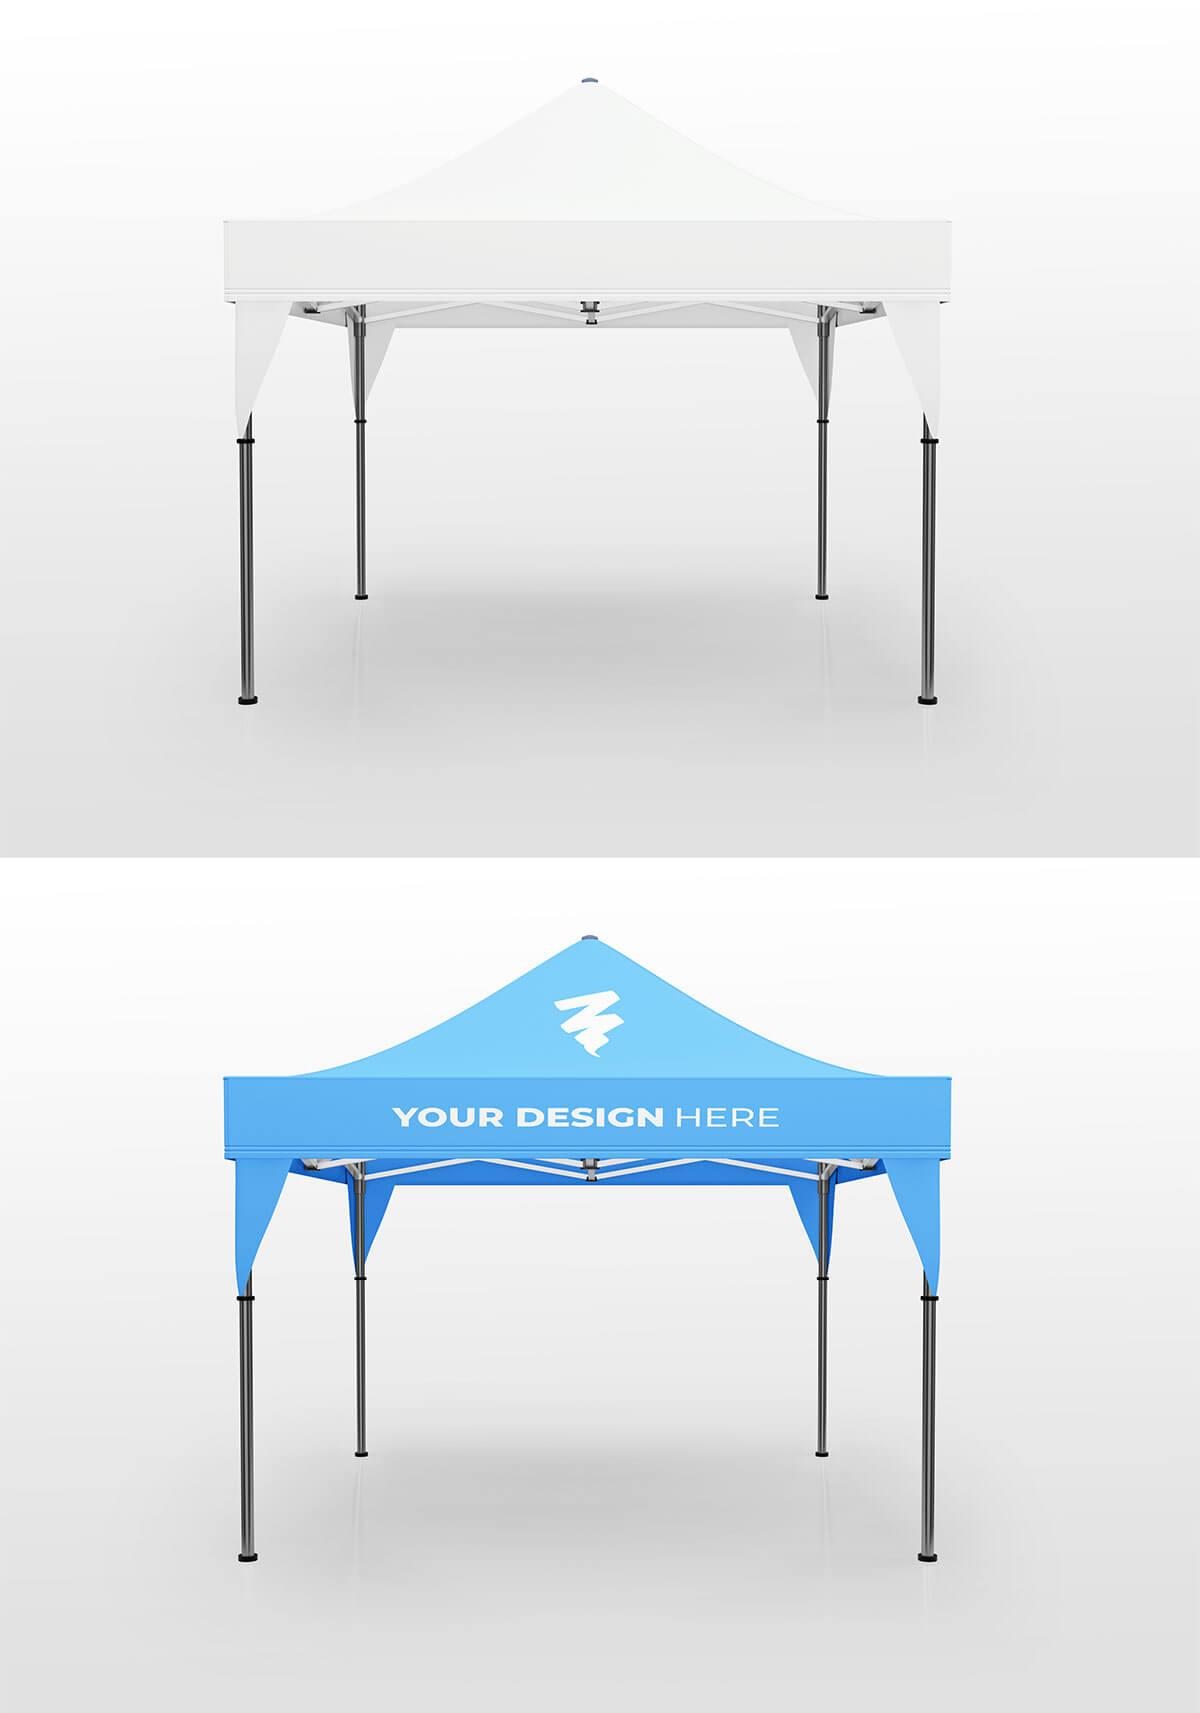 Free Display Tent Mockup V2